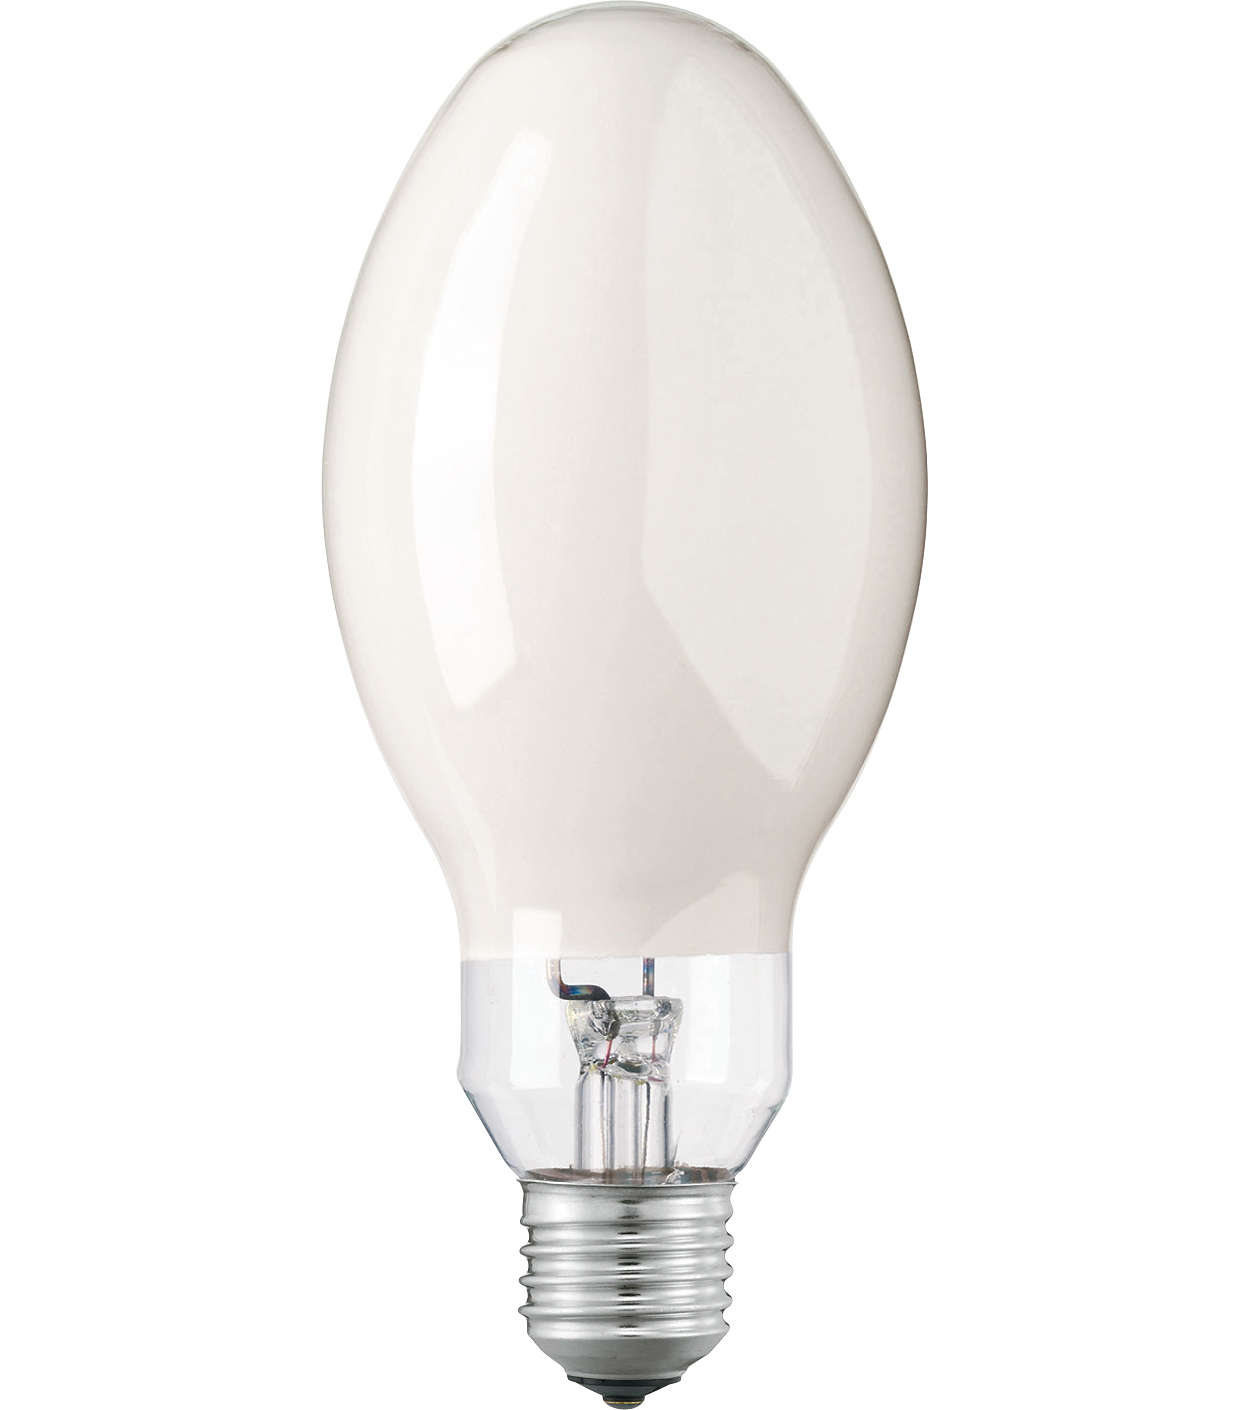 mercury vapor standard hpl high pressure mercury philips lighting. Black Bedroom Furniture Sets. Home Design Ideas